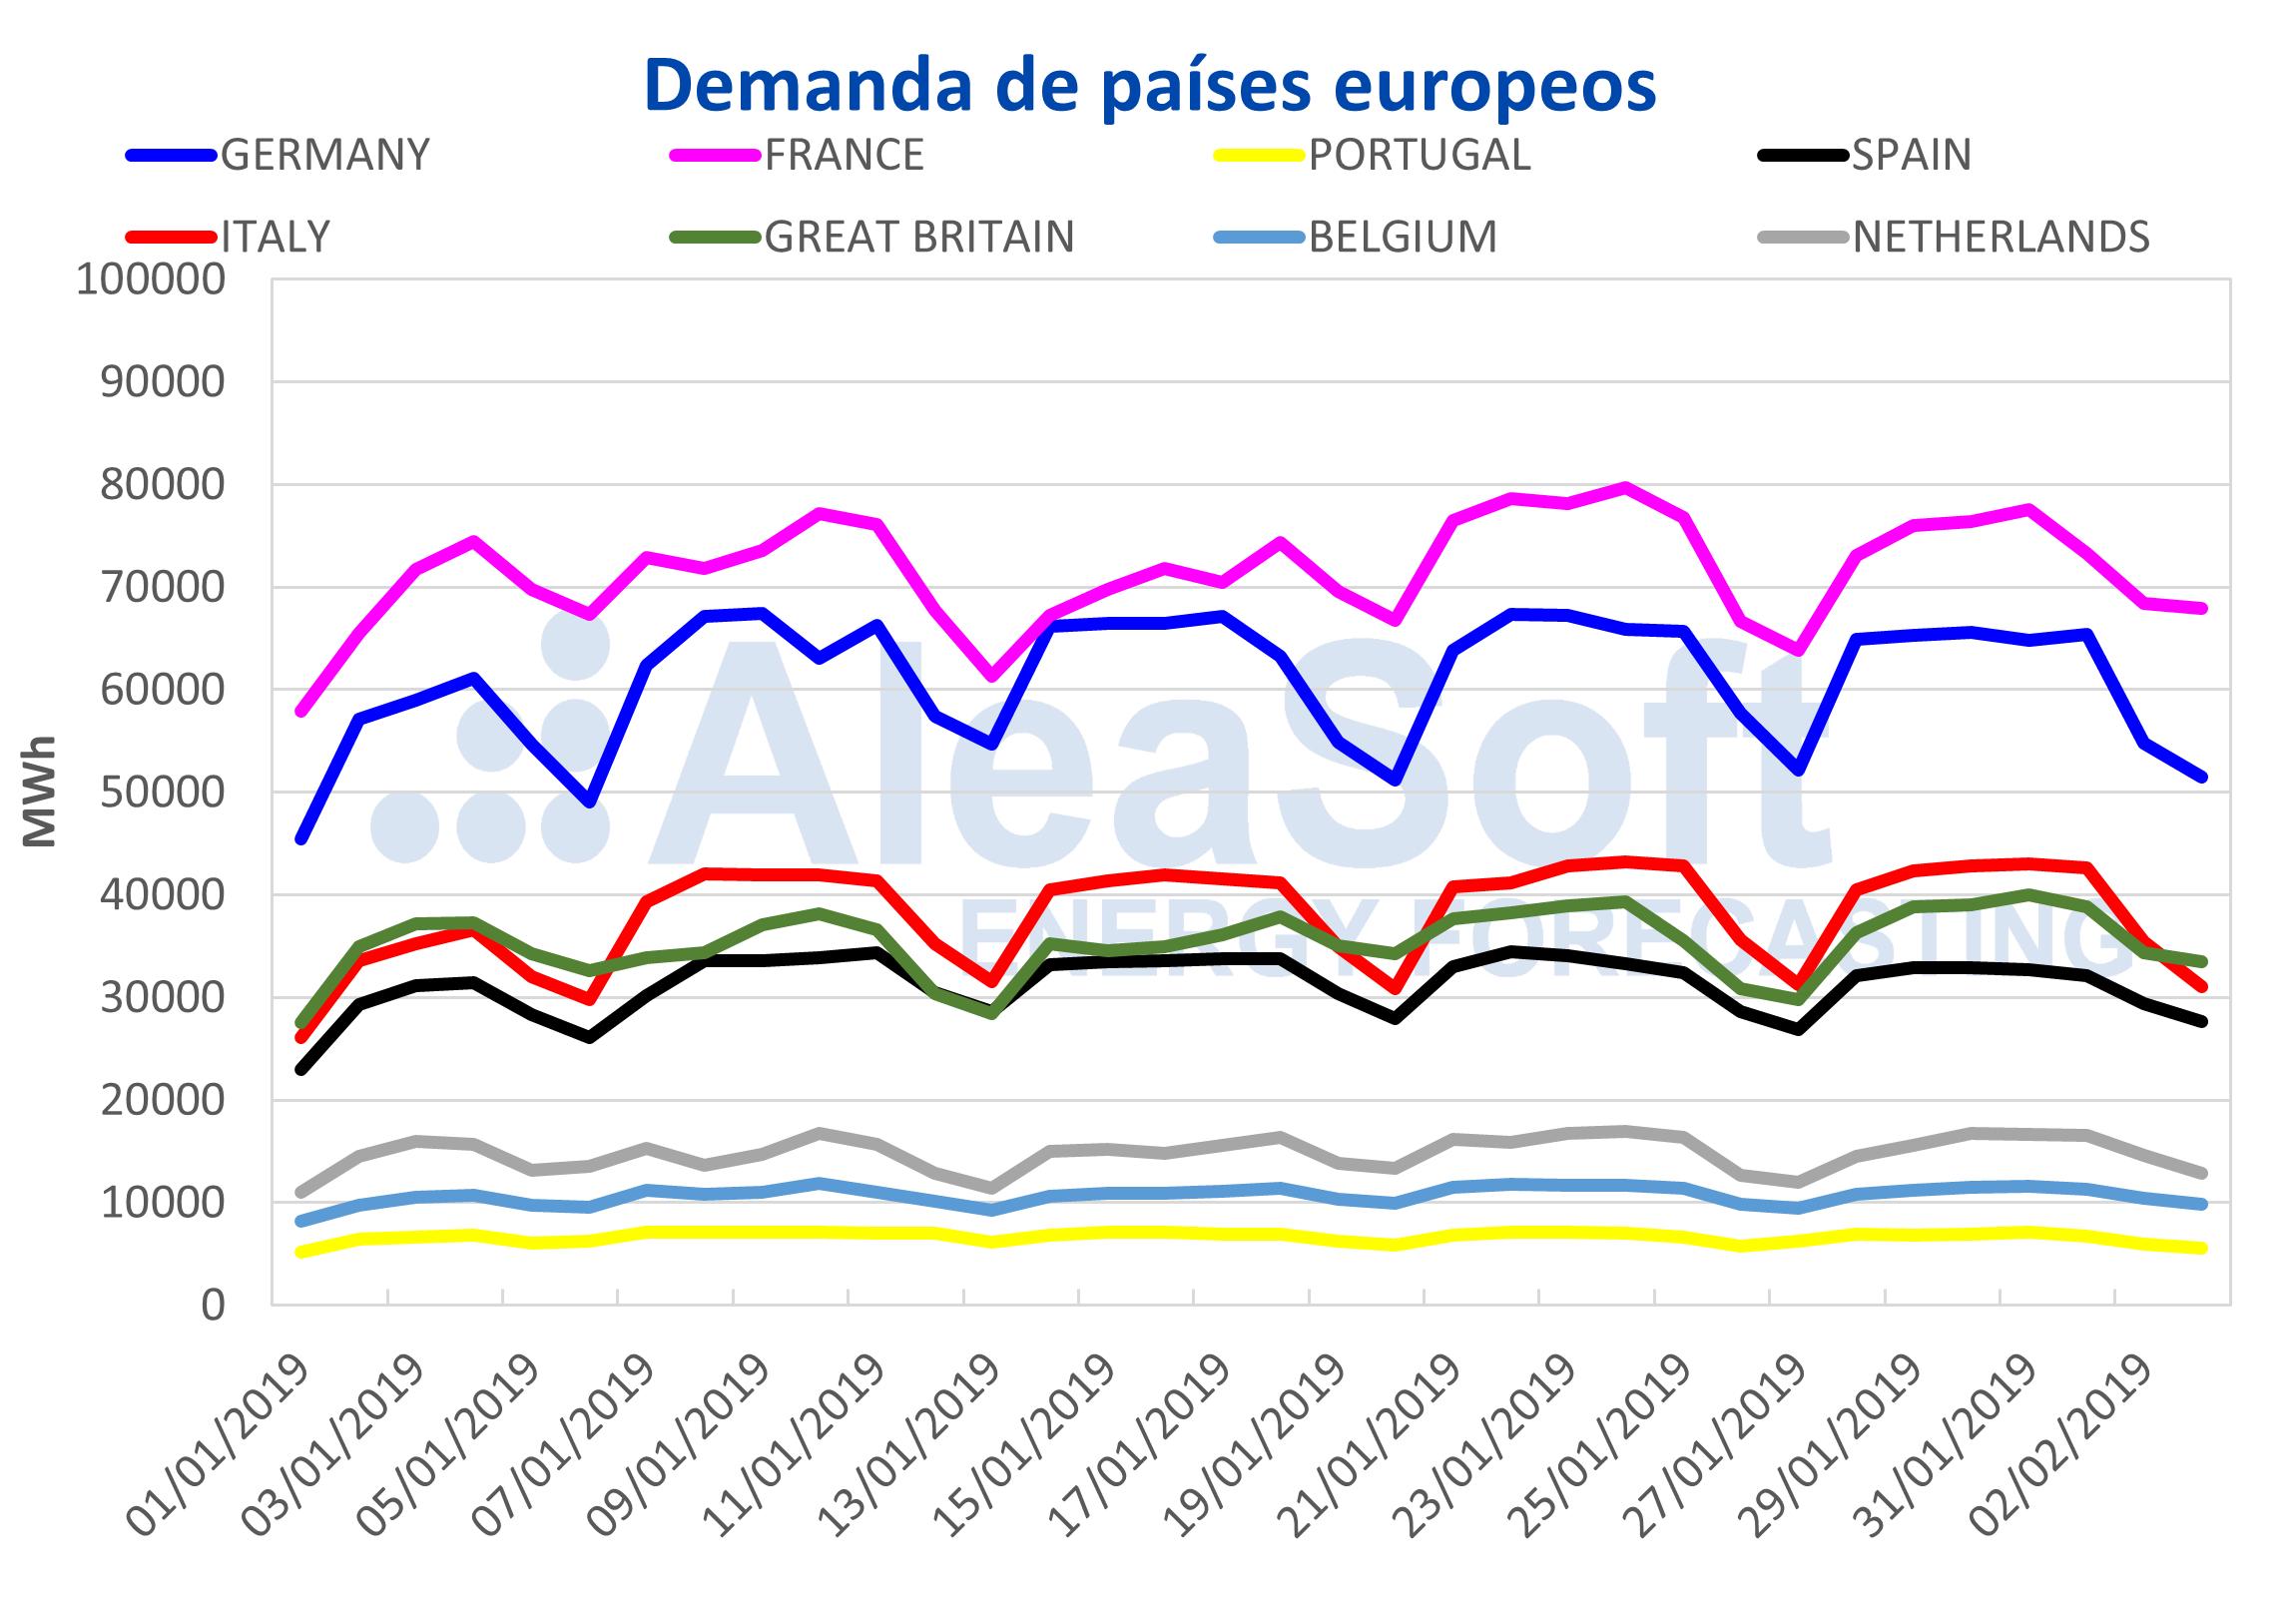 AleaSoft - Demanda de paises europeos